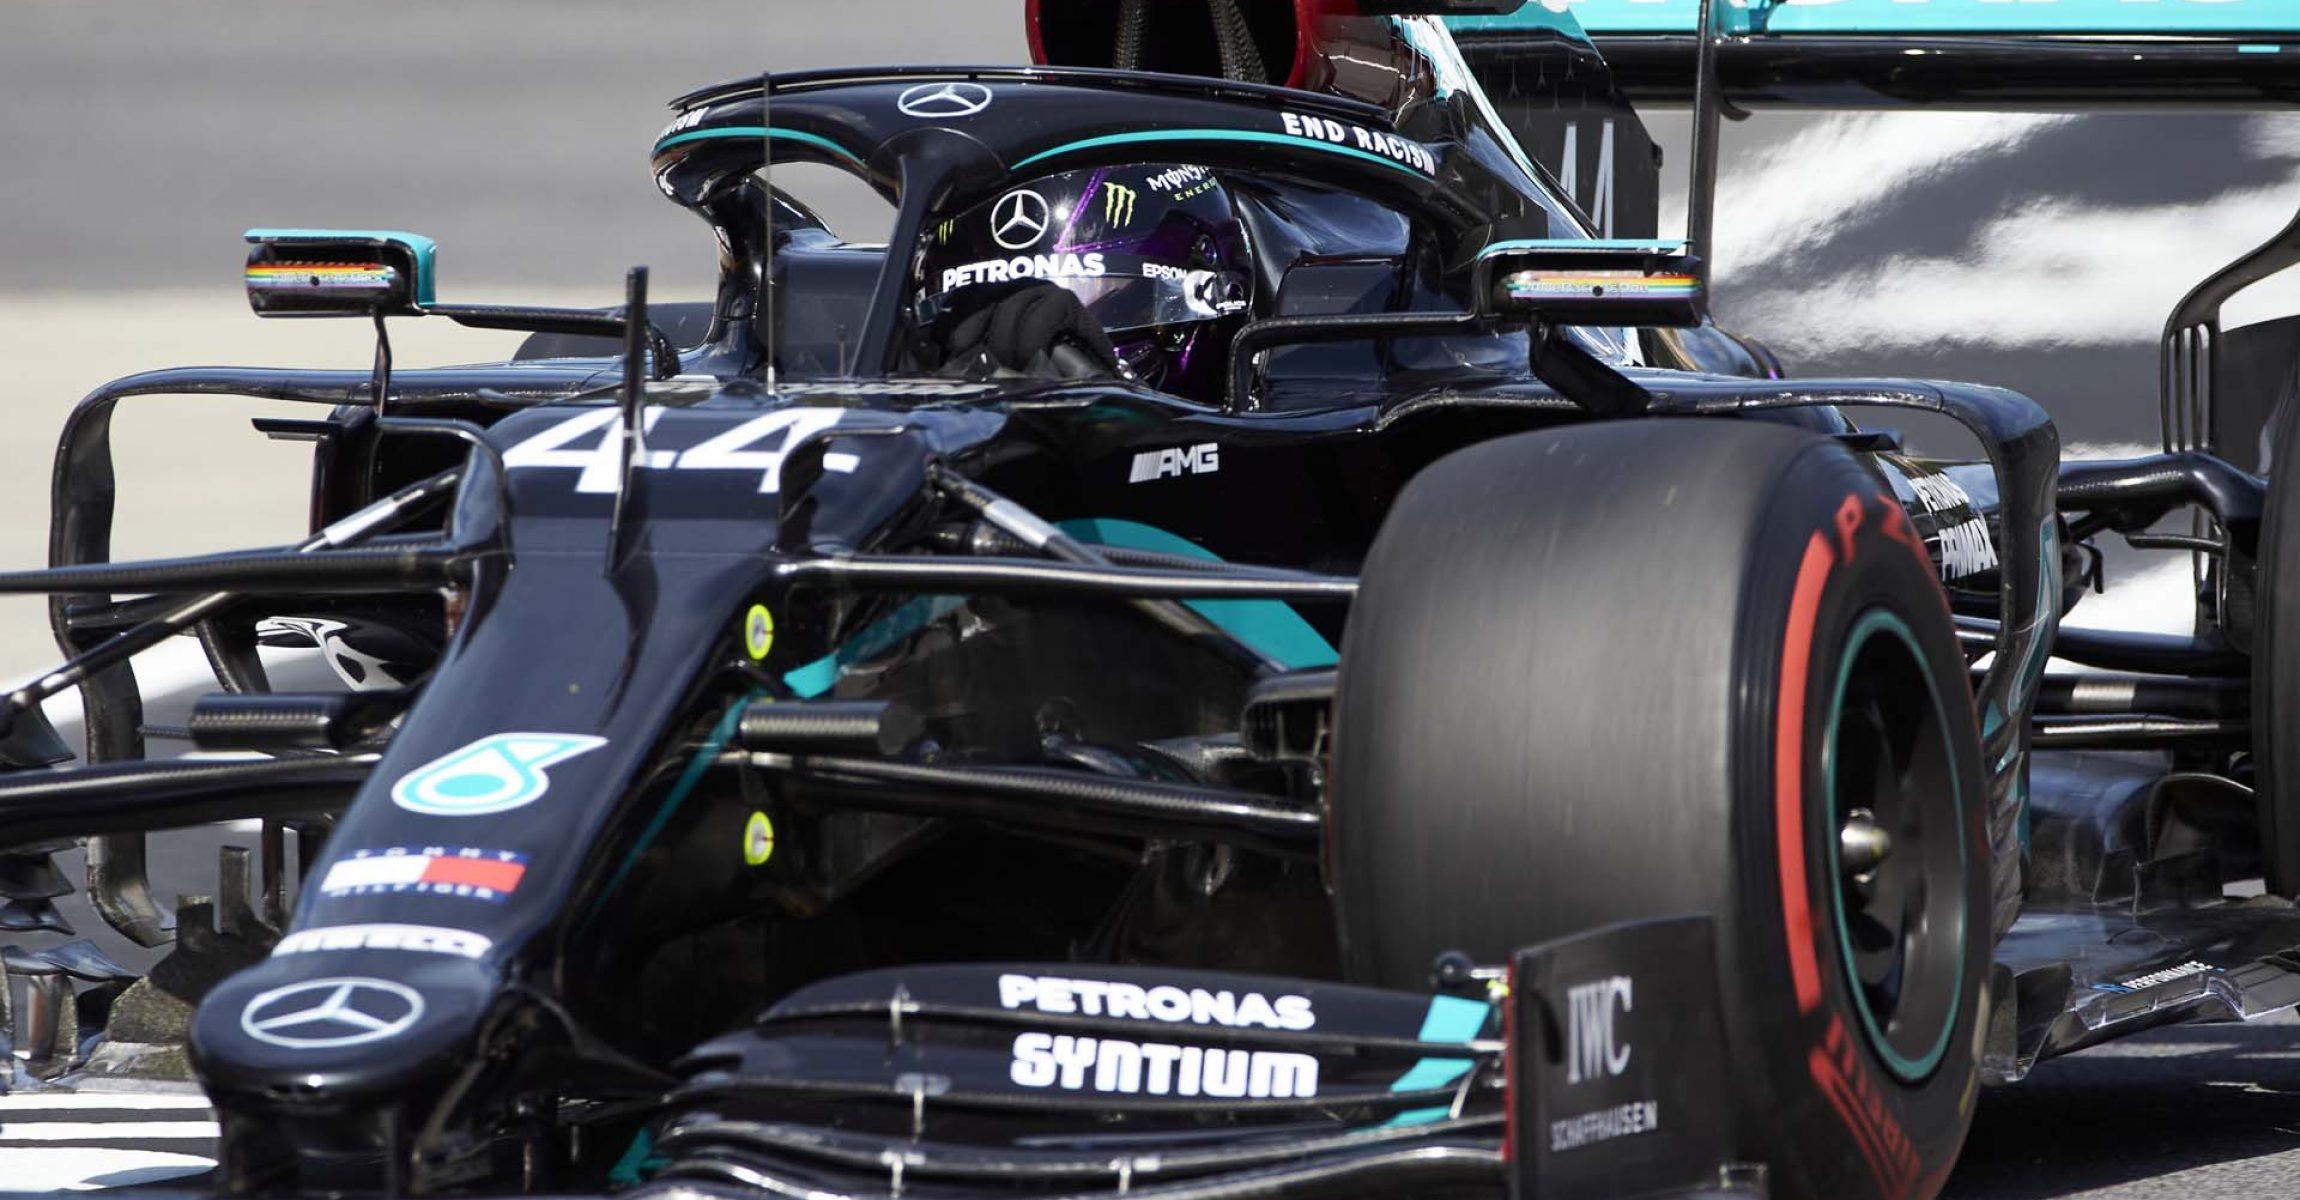 2020 Styrian Grand Prix, Friday - Steve Etherington Lewis Hamilton Mercedes